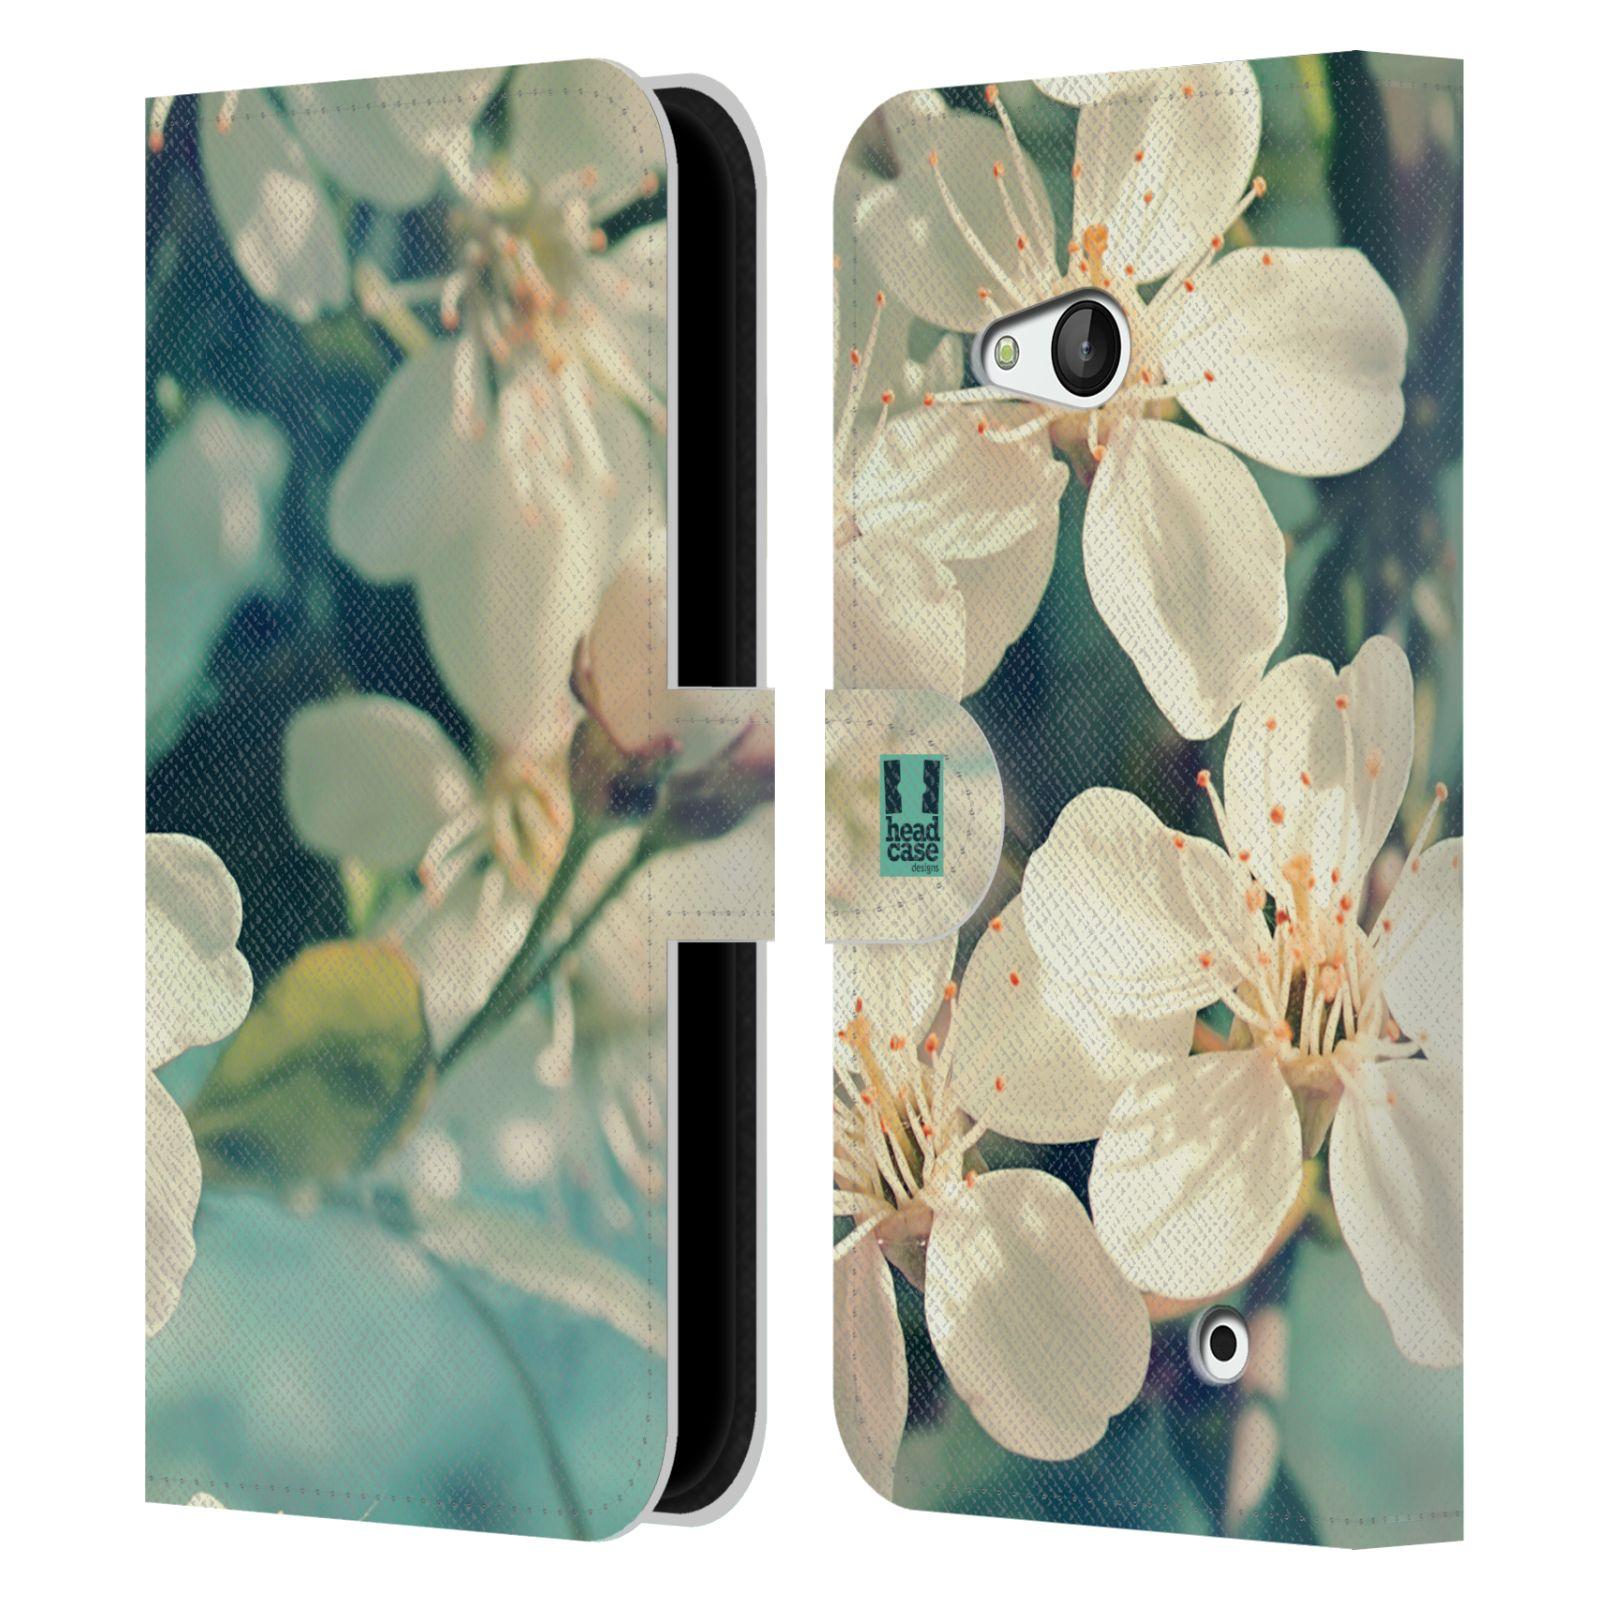 HEAD CASE Flipové pouzdro pro mobil NOKIA / MICROSOFT LUMIA 640 / LUMIA 640 DUAL květy foto rozkvetlá třešeň